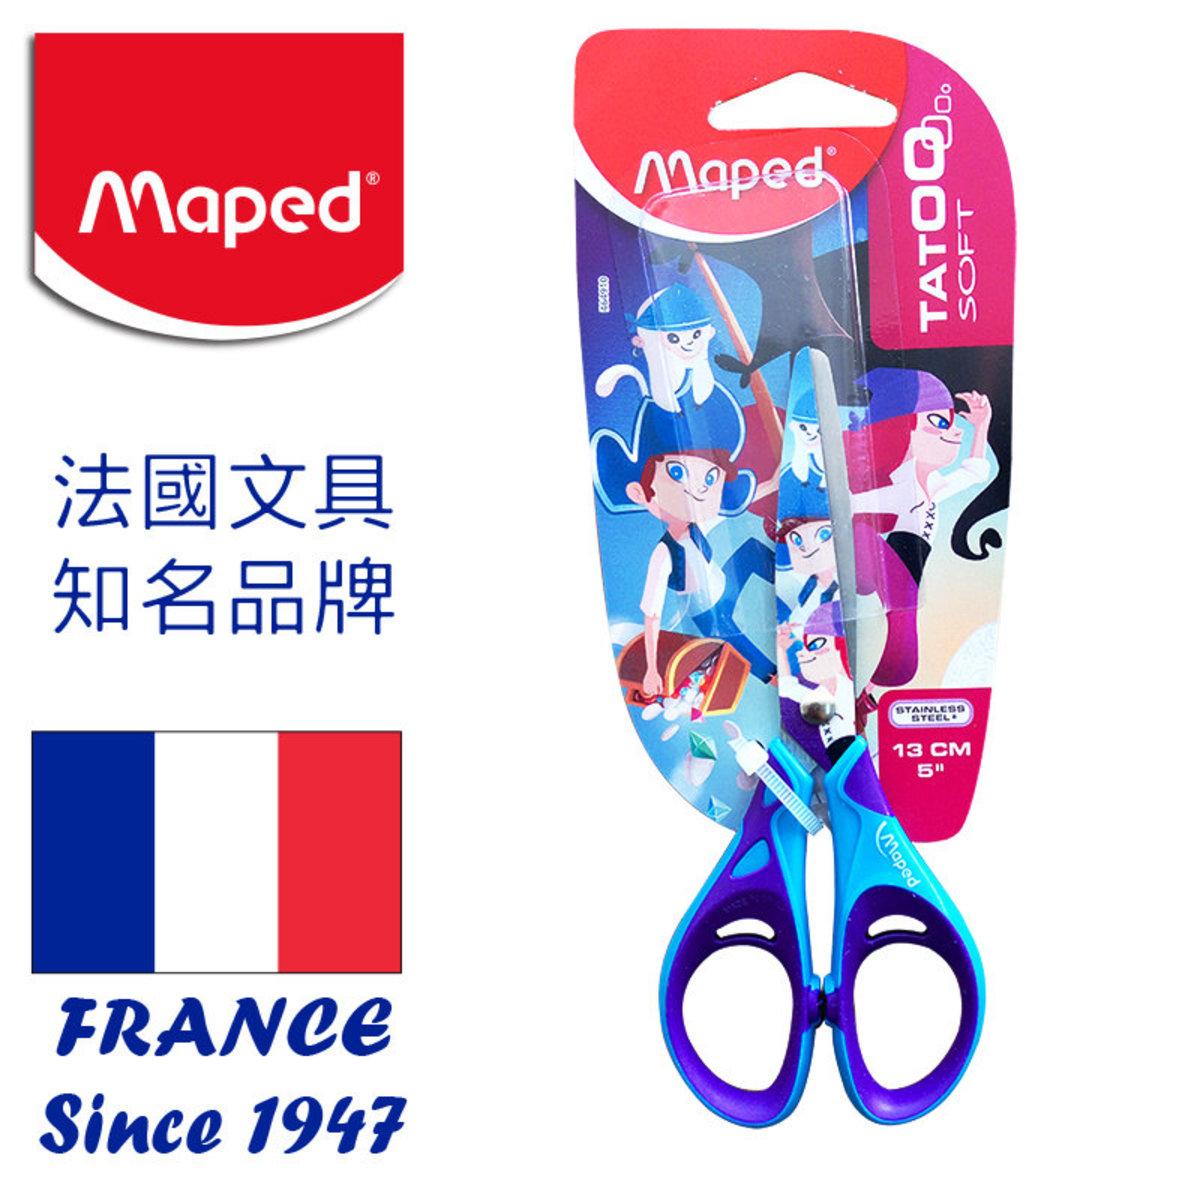 Maped 馬培德 13cm 時款公仔軟柄剪刀 (掛咭裝) (藍色)